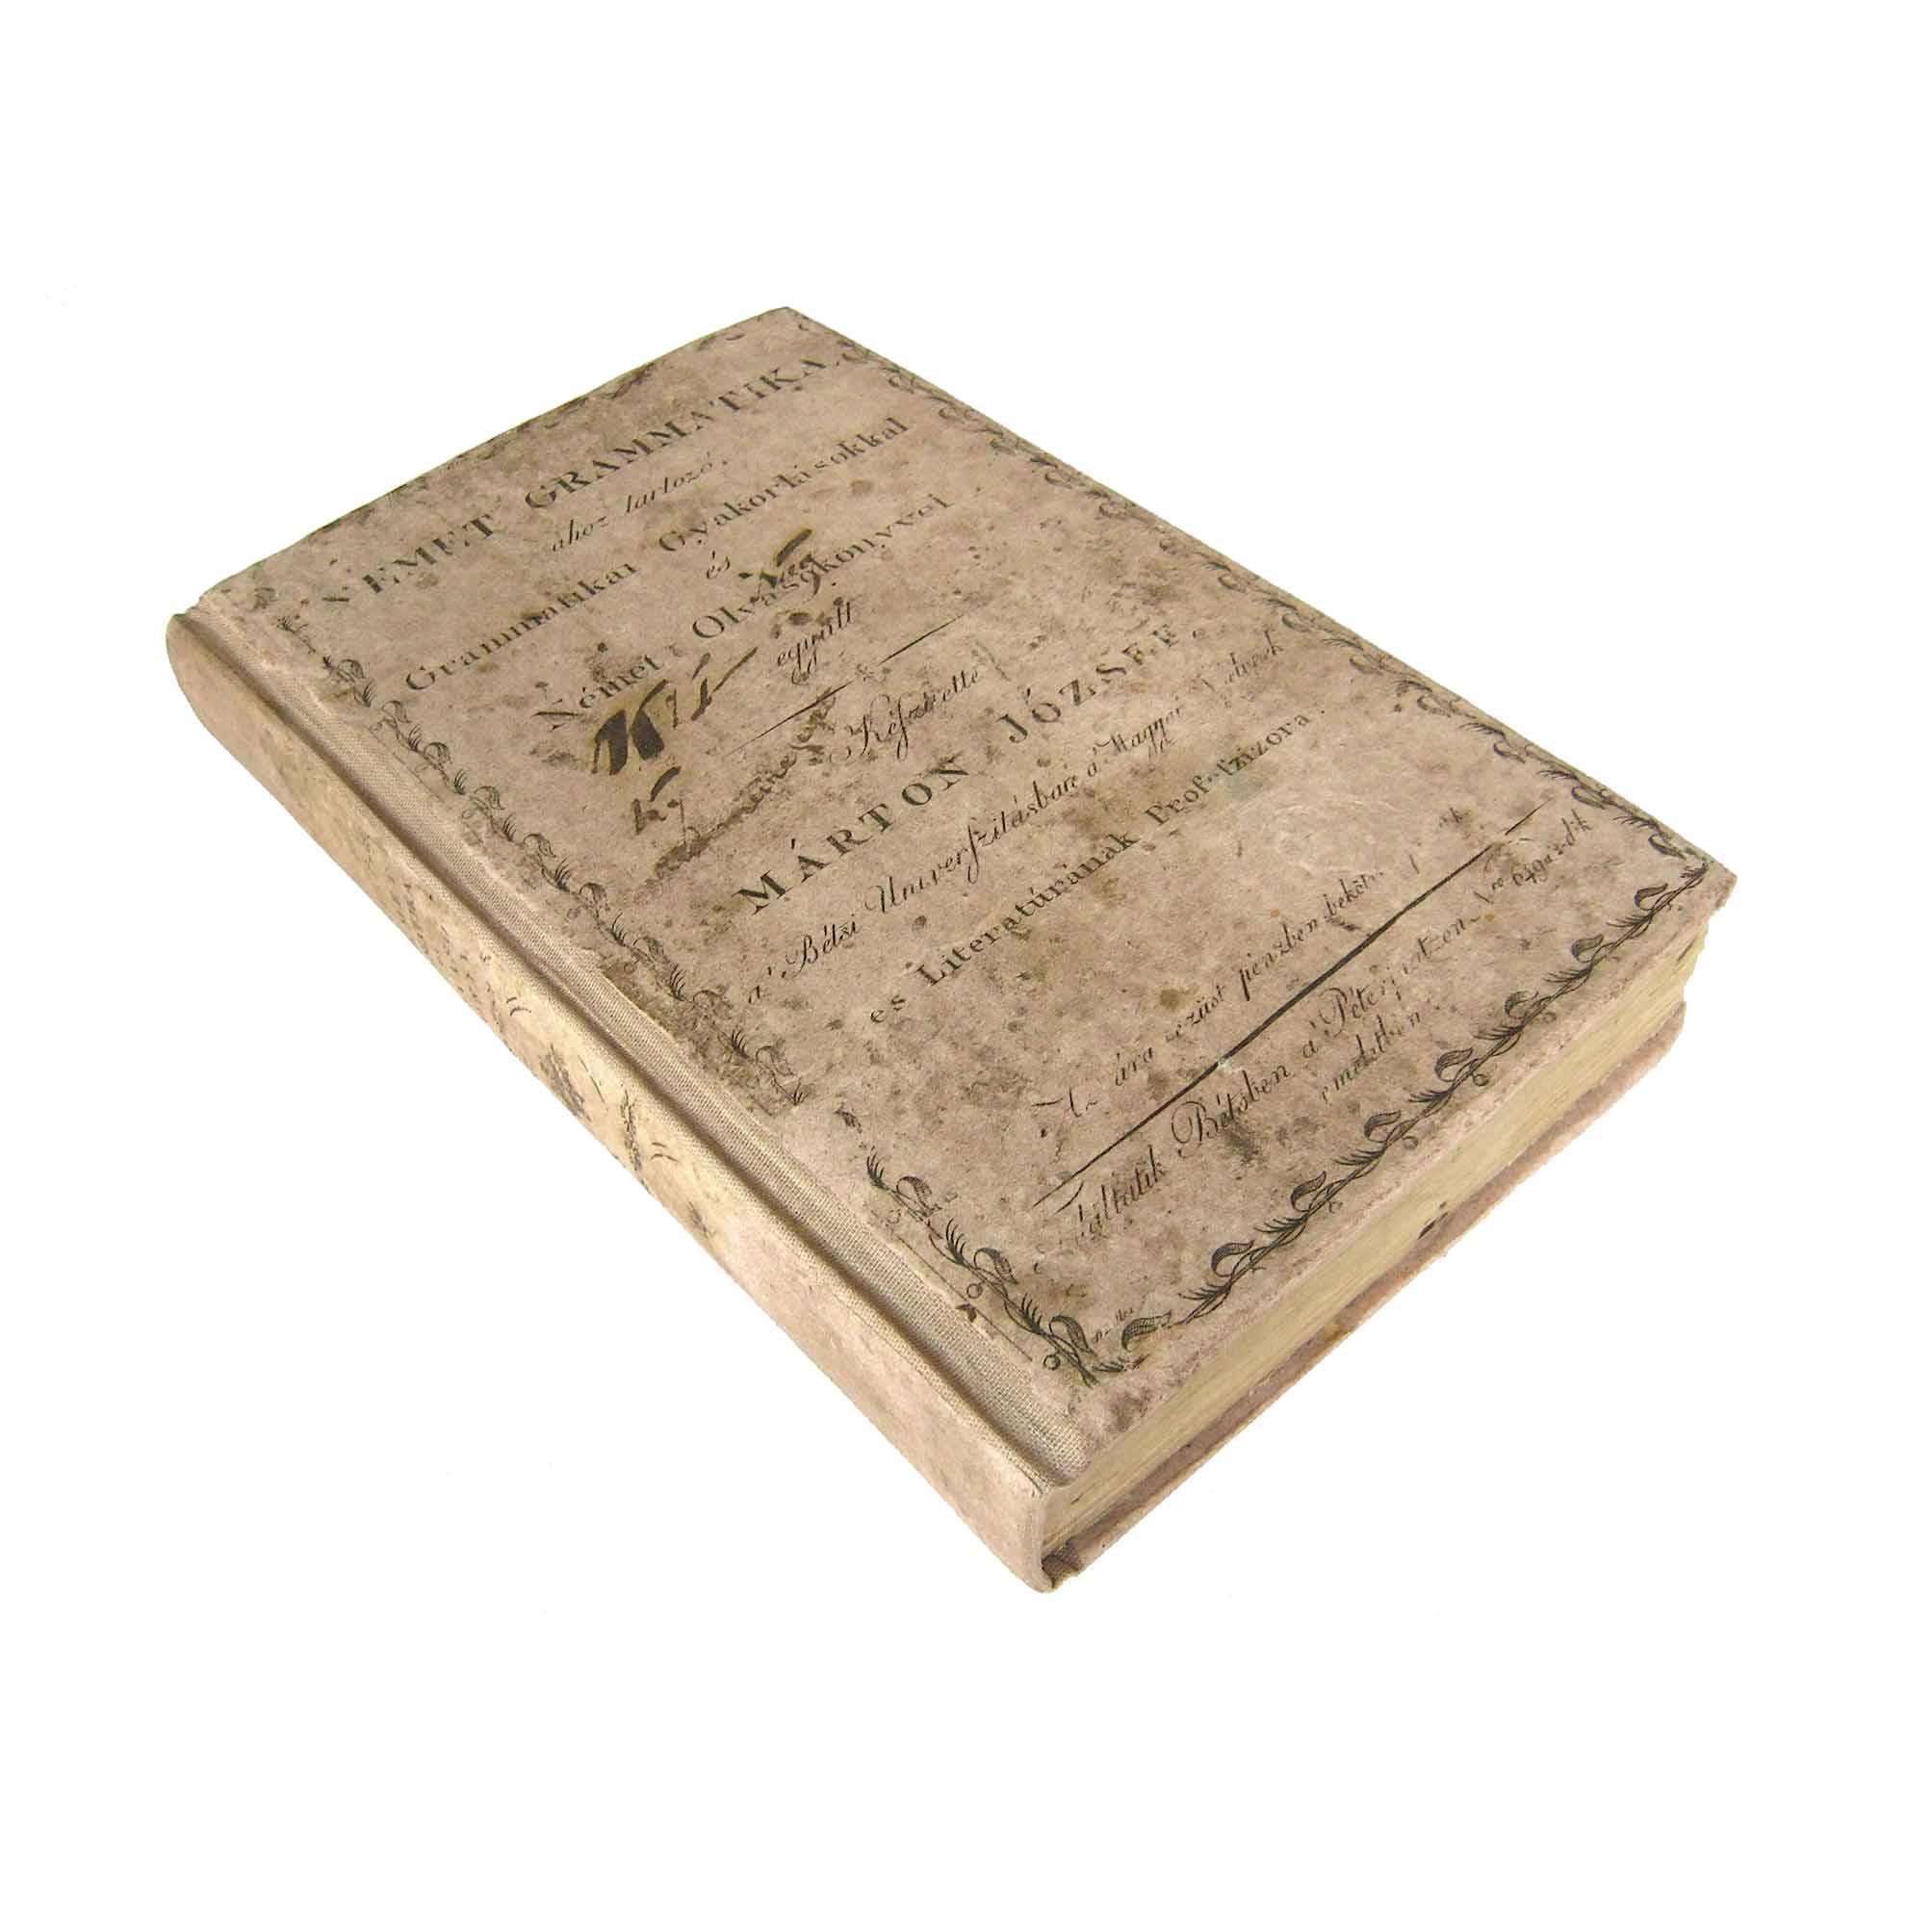 5081-Marton-Nemet-Grammatika-1810-Einband-recto-frei-N.jpg